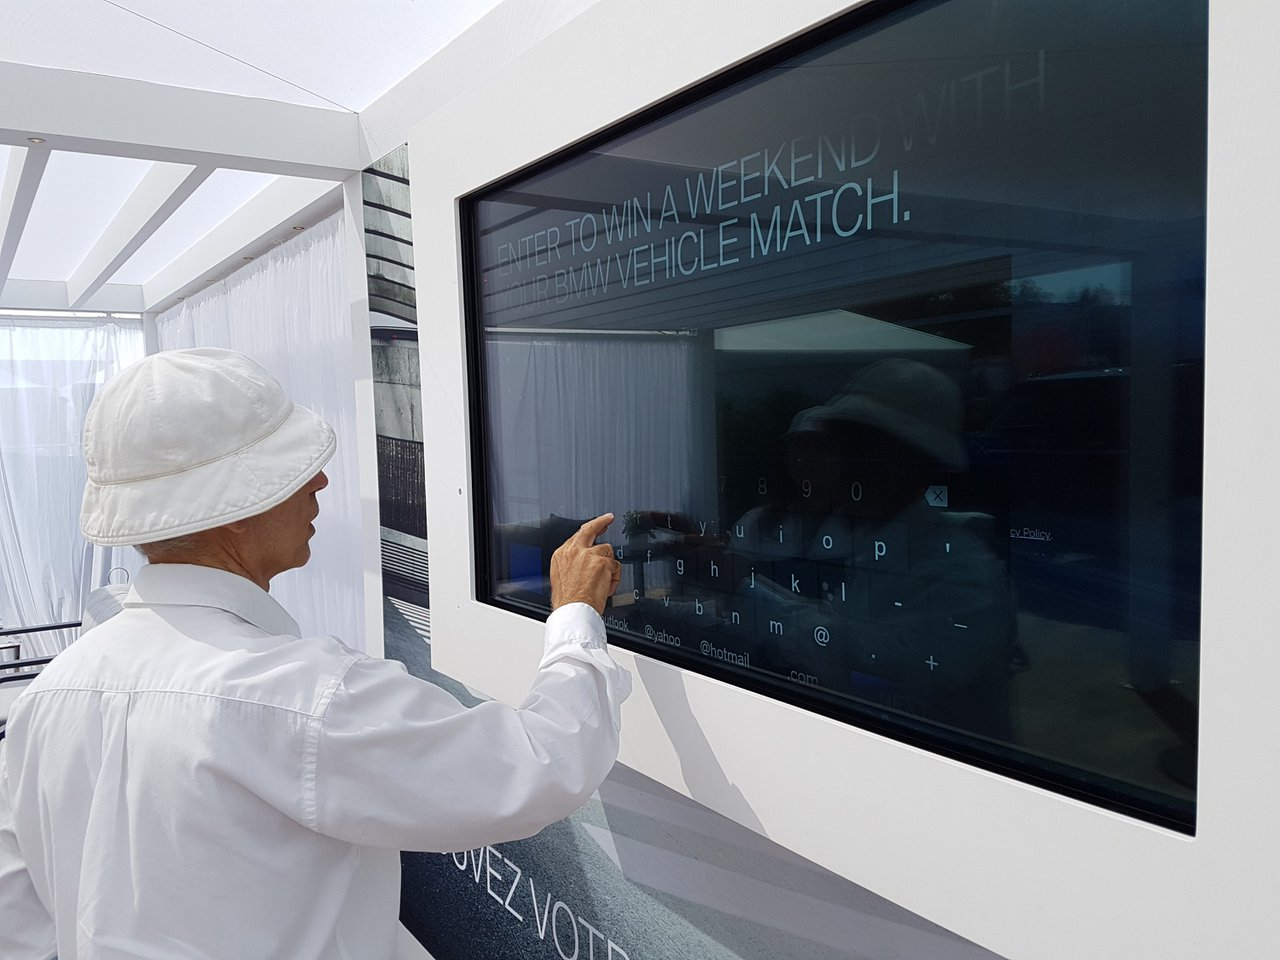 BMW Matchmaker Digital Interactive Game photo 20190804_102237.jpg